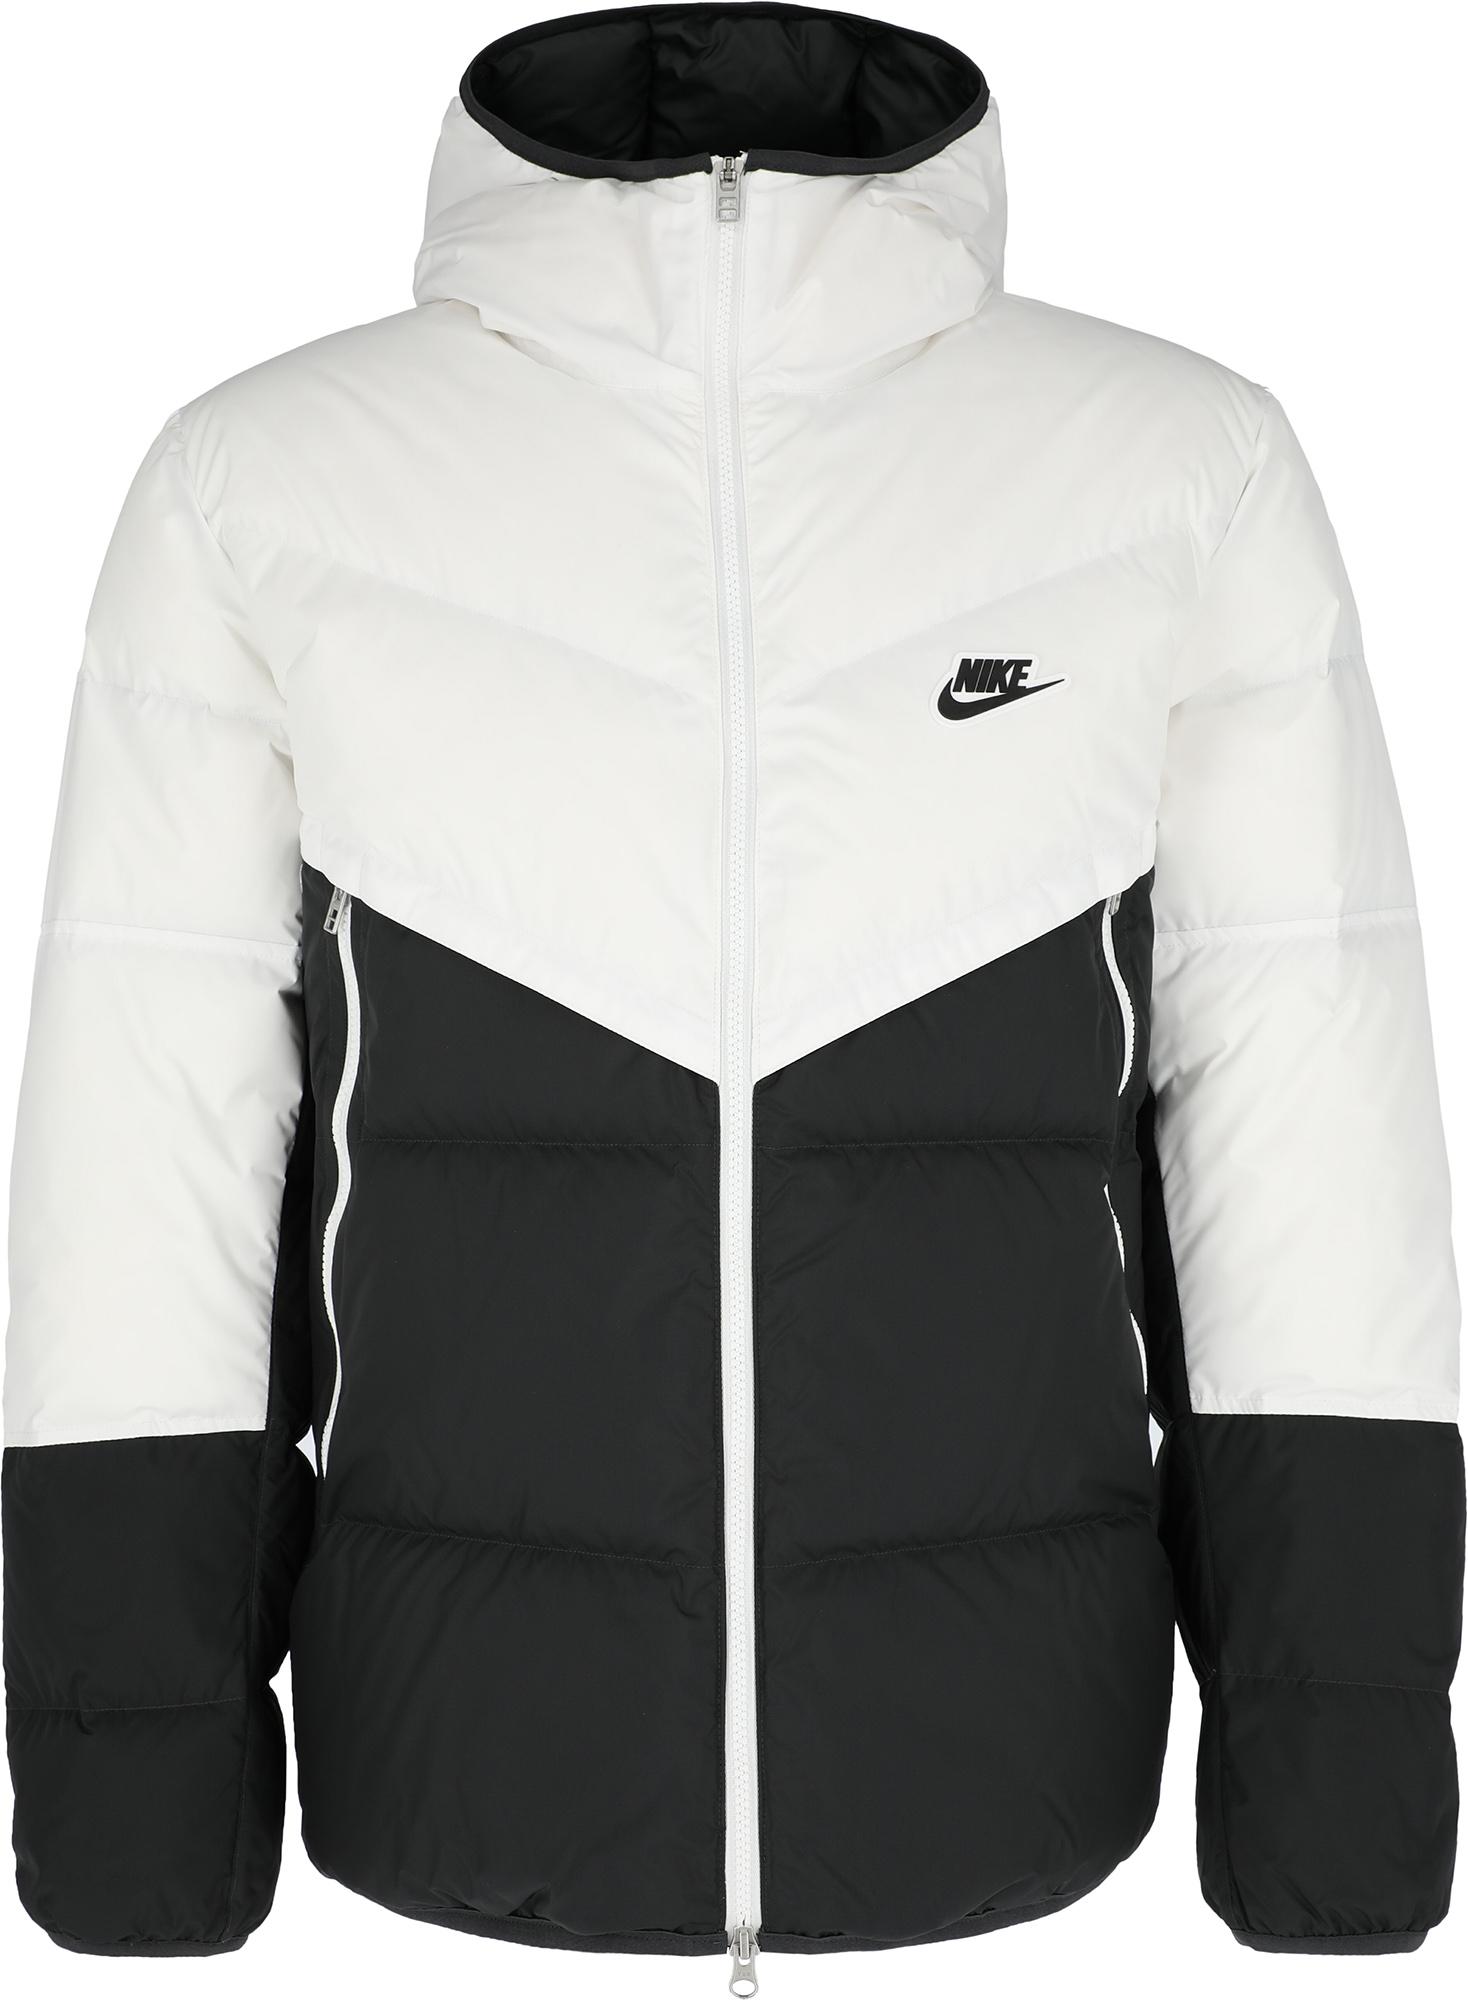 Фото - Nike Пуховик мужской Nike Sportswear Windrunner, размер 52-54 nike свитшот мужской nike sportswear just do it размер 52 54